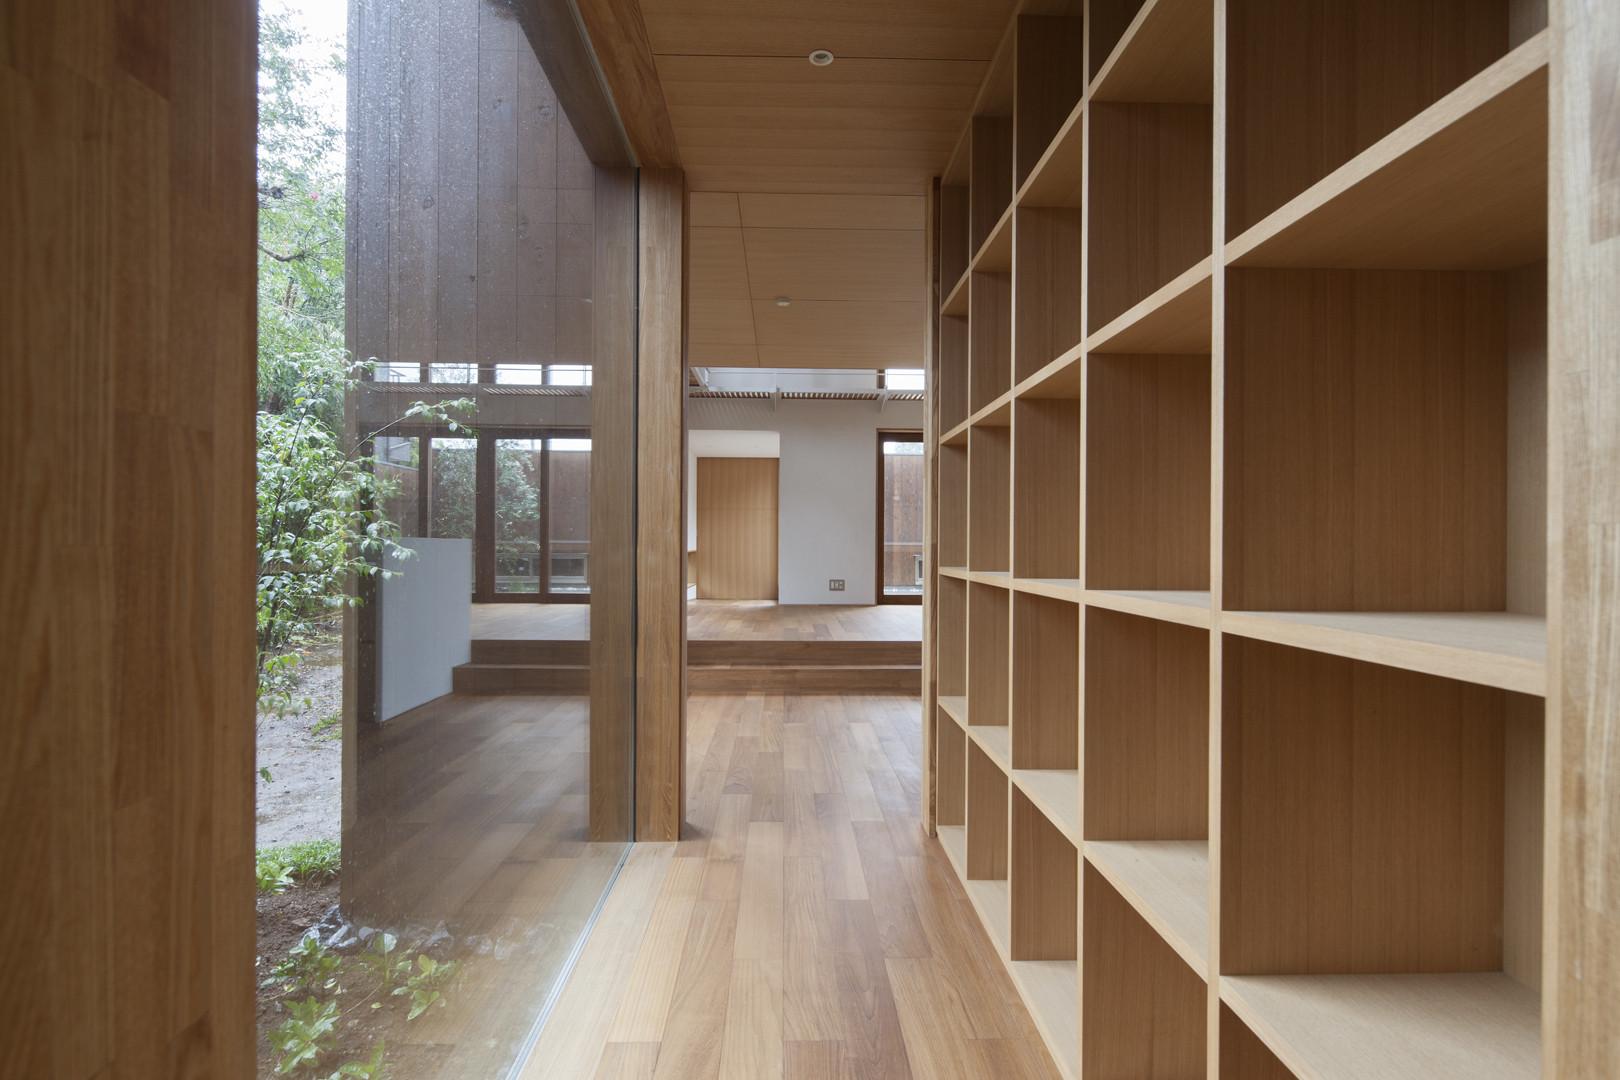 House in Komae / architect cafe, © Satoshi Asakawa